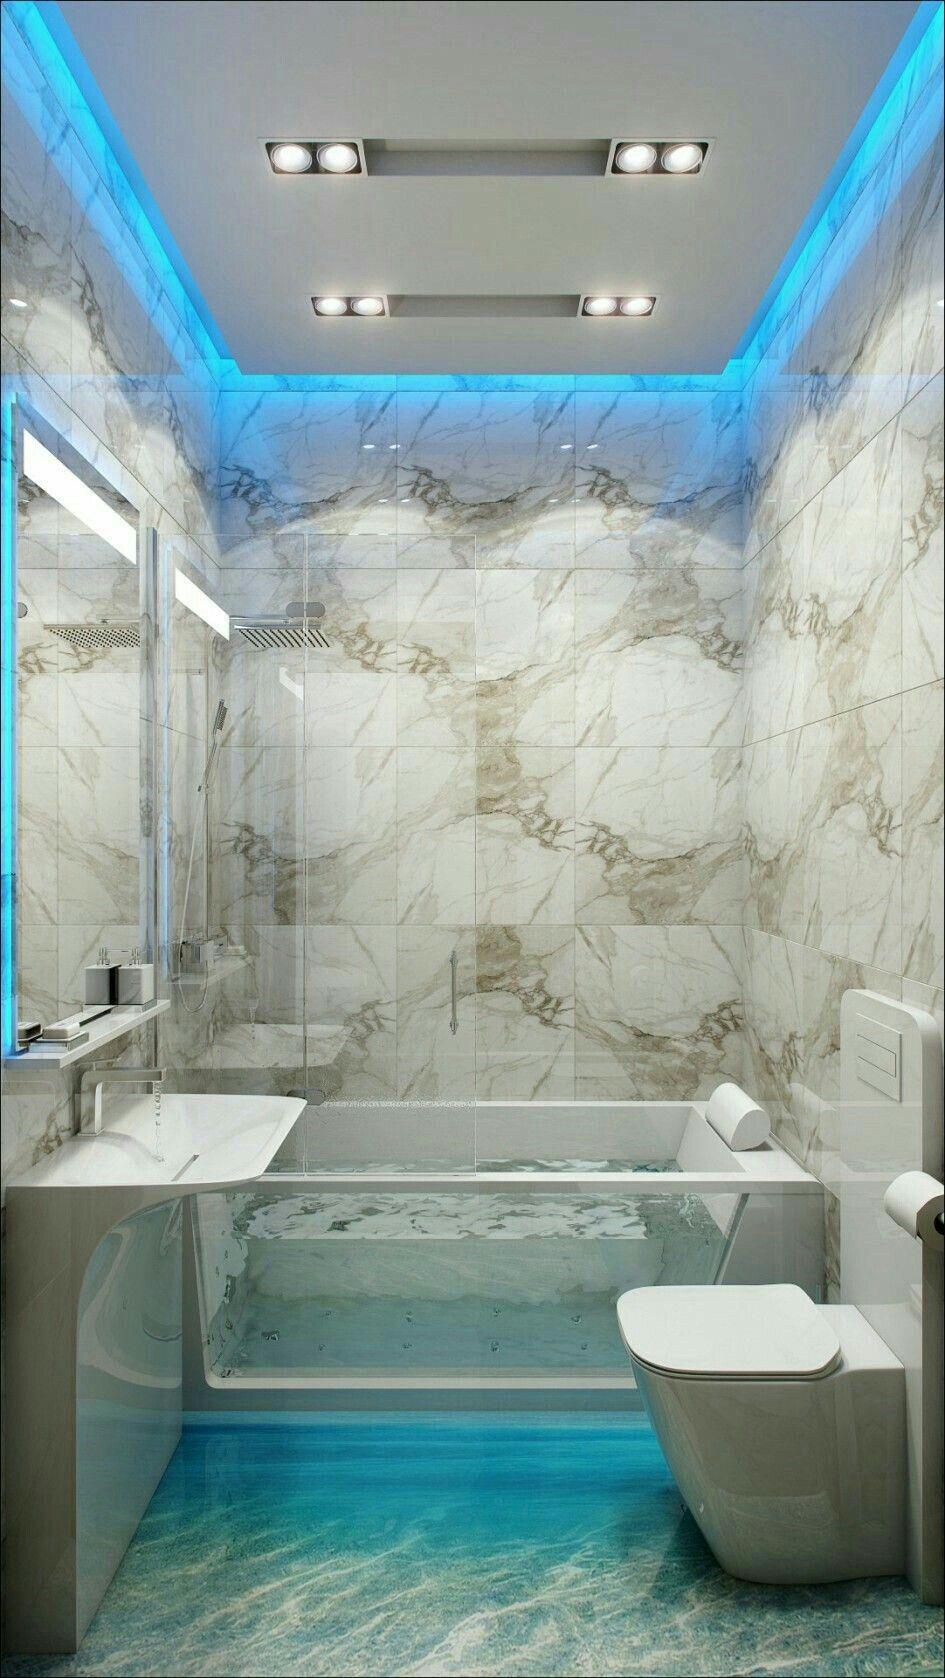 Bathroom | design | Pinterest | Strip lighting, Small house plans ...